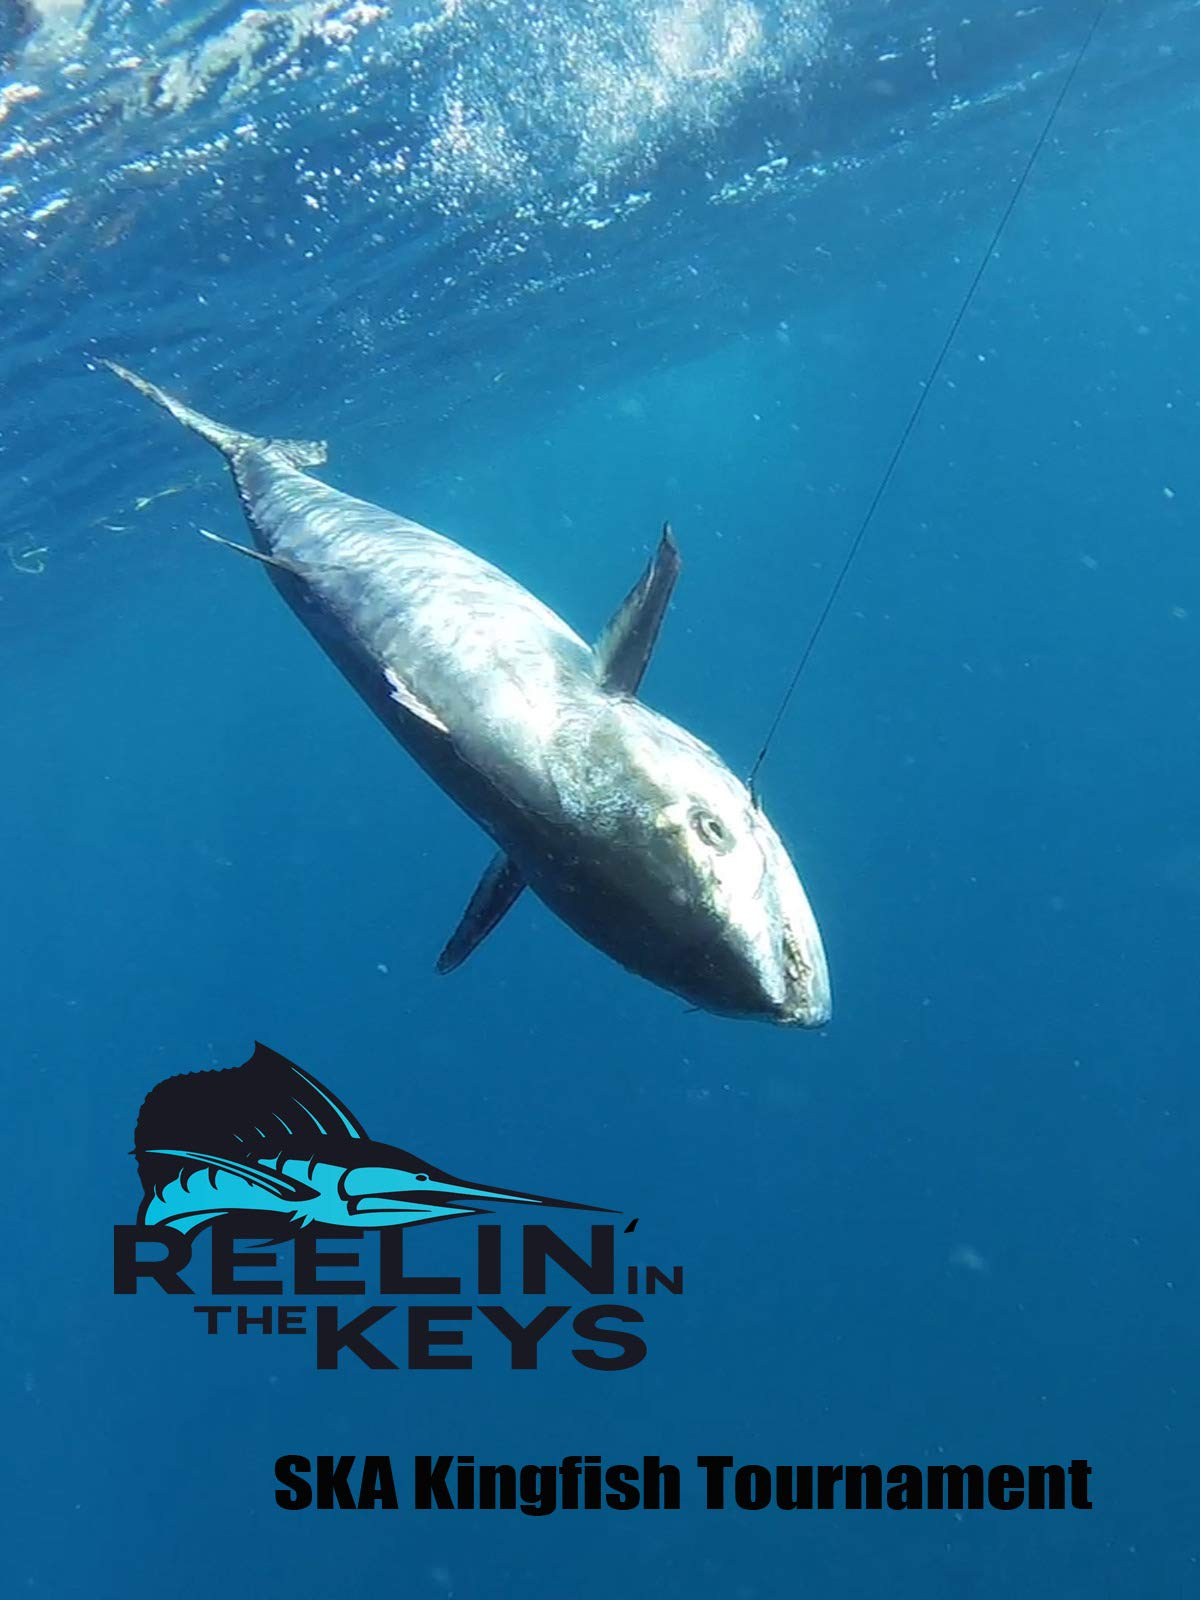 Reelin' In The Keys -SKA Kingfish Tournament